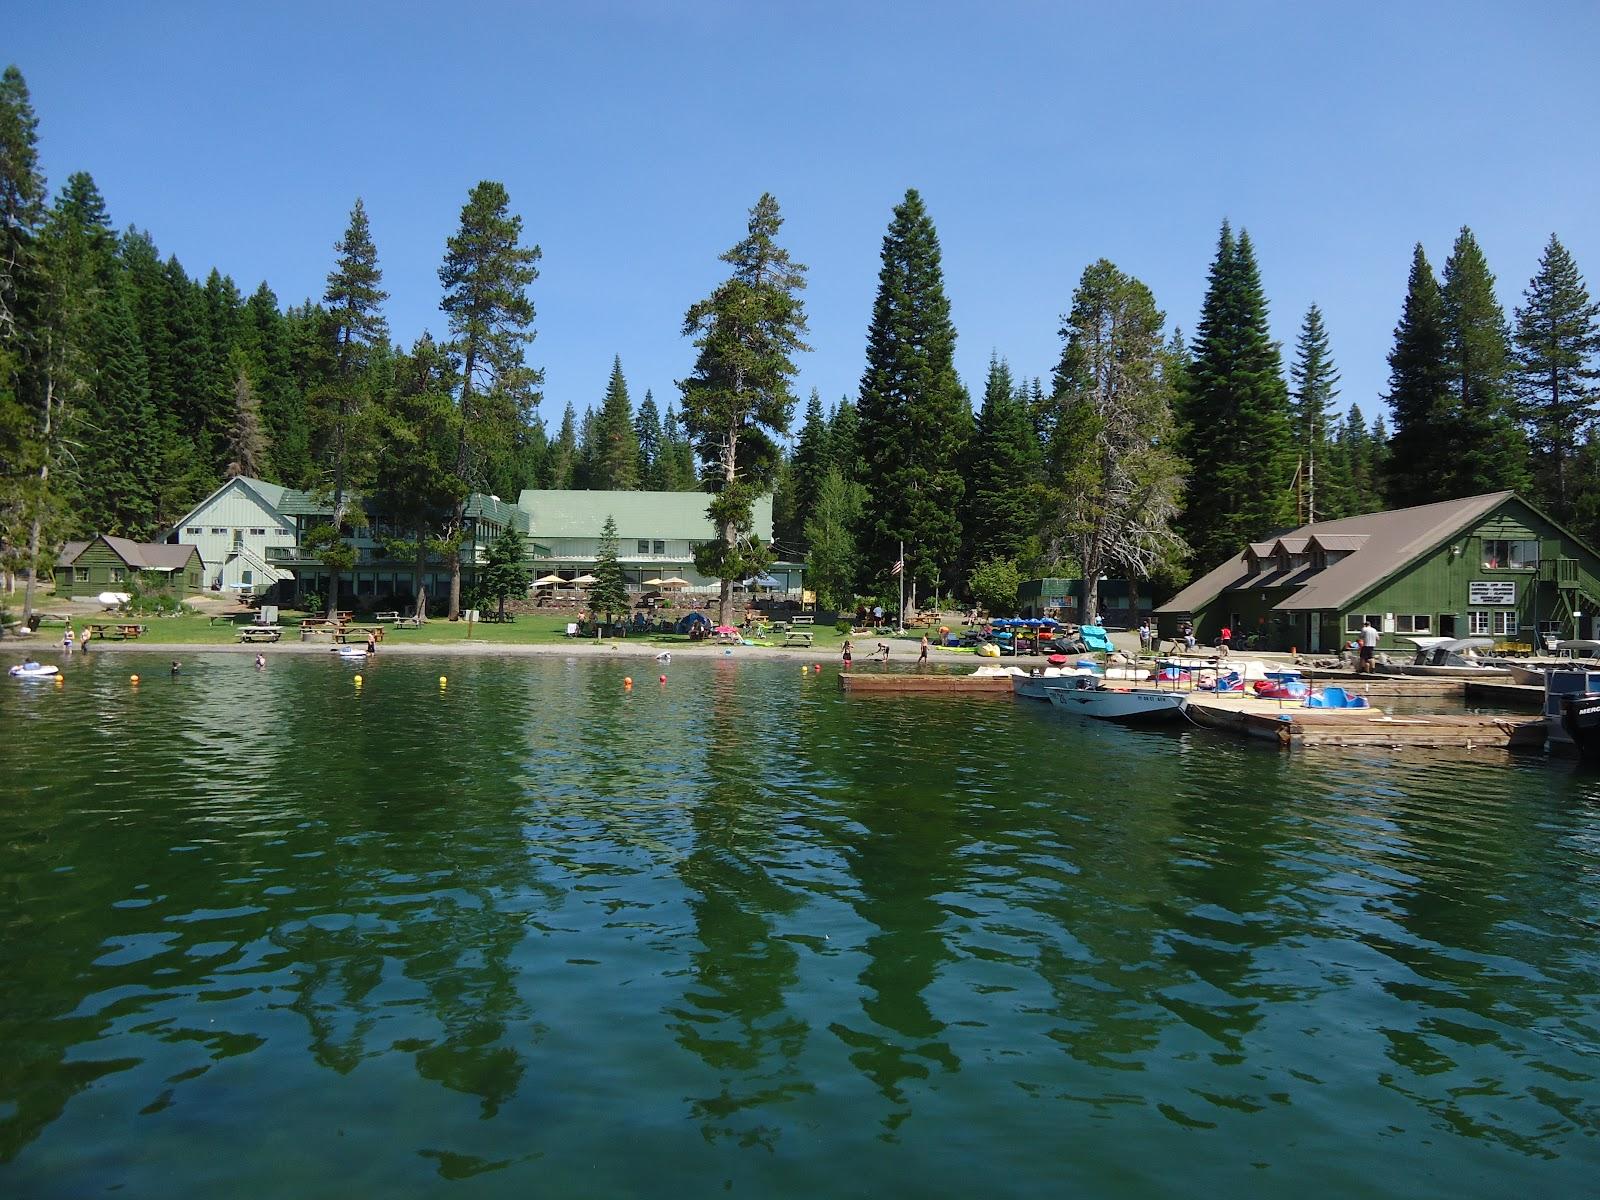 swingers in diamond lake oregon